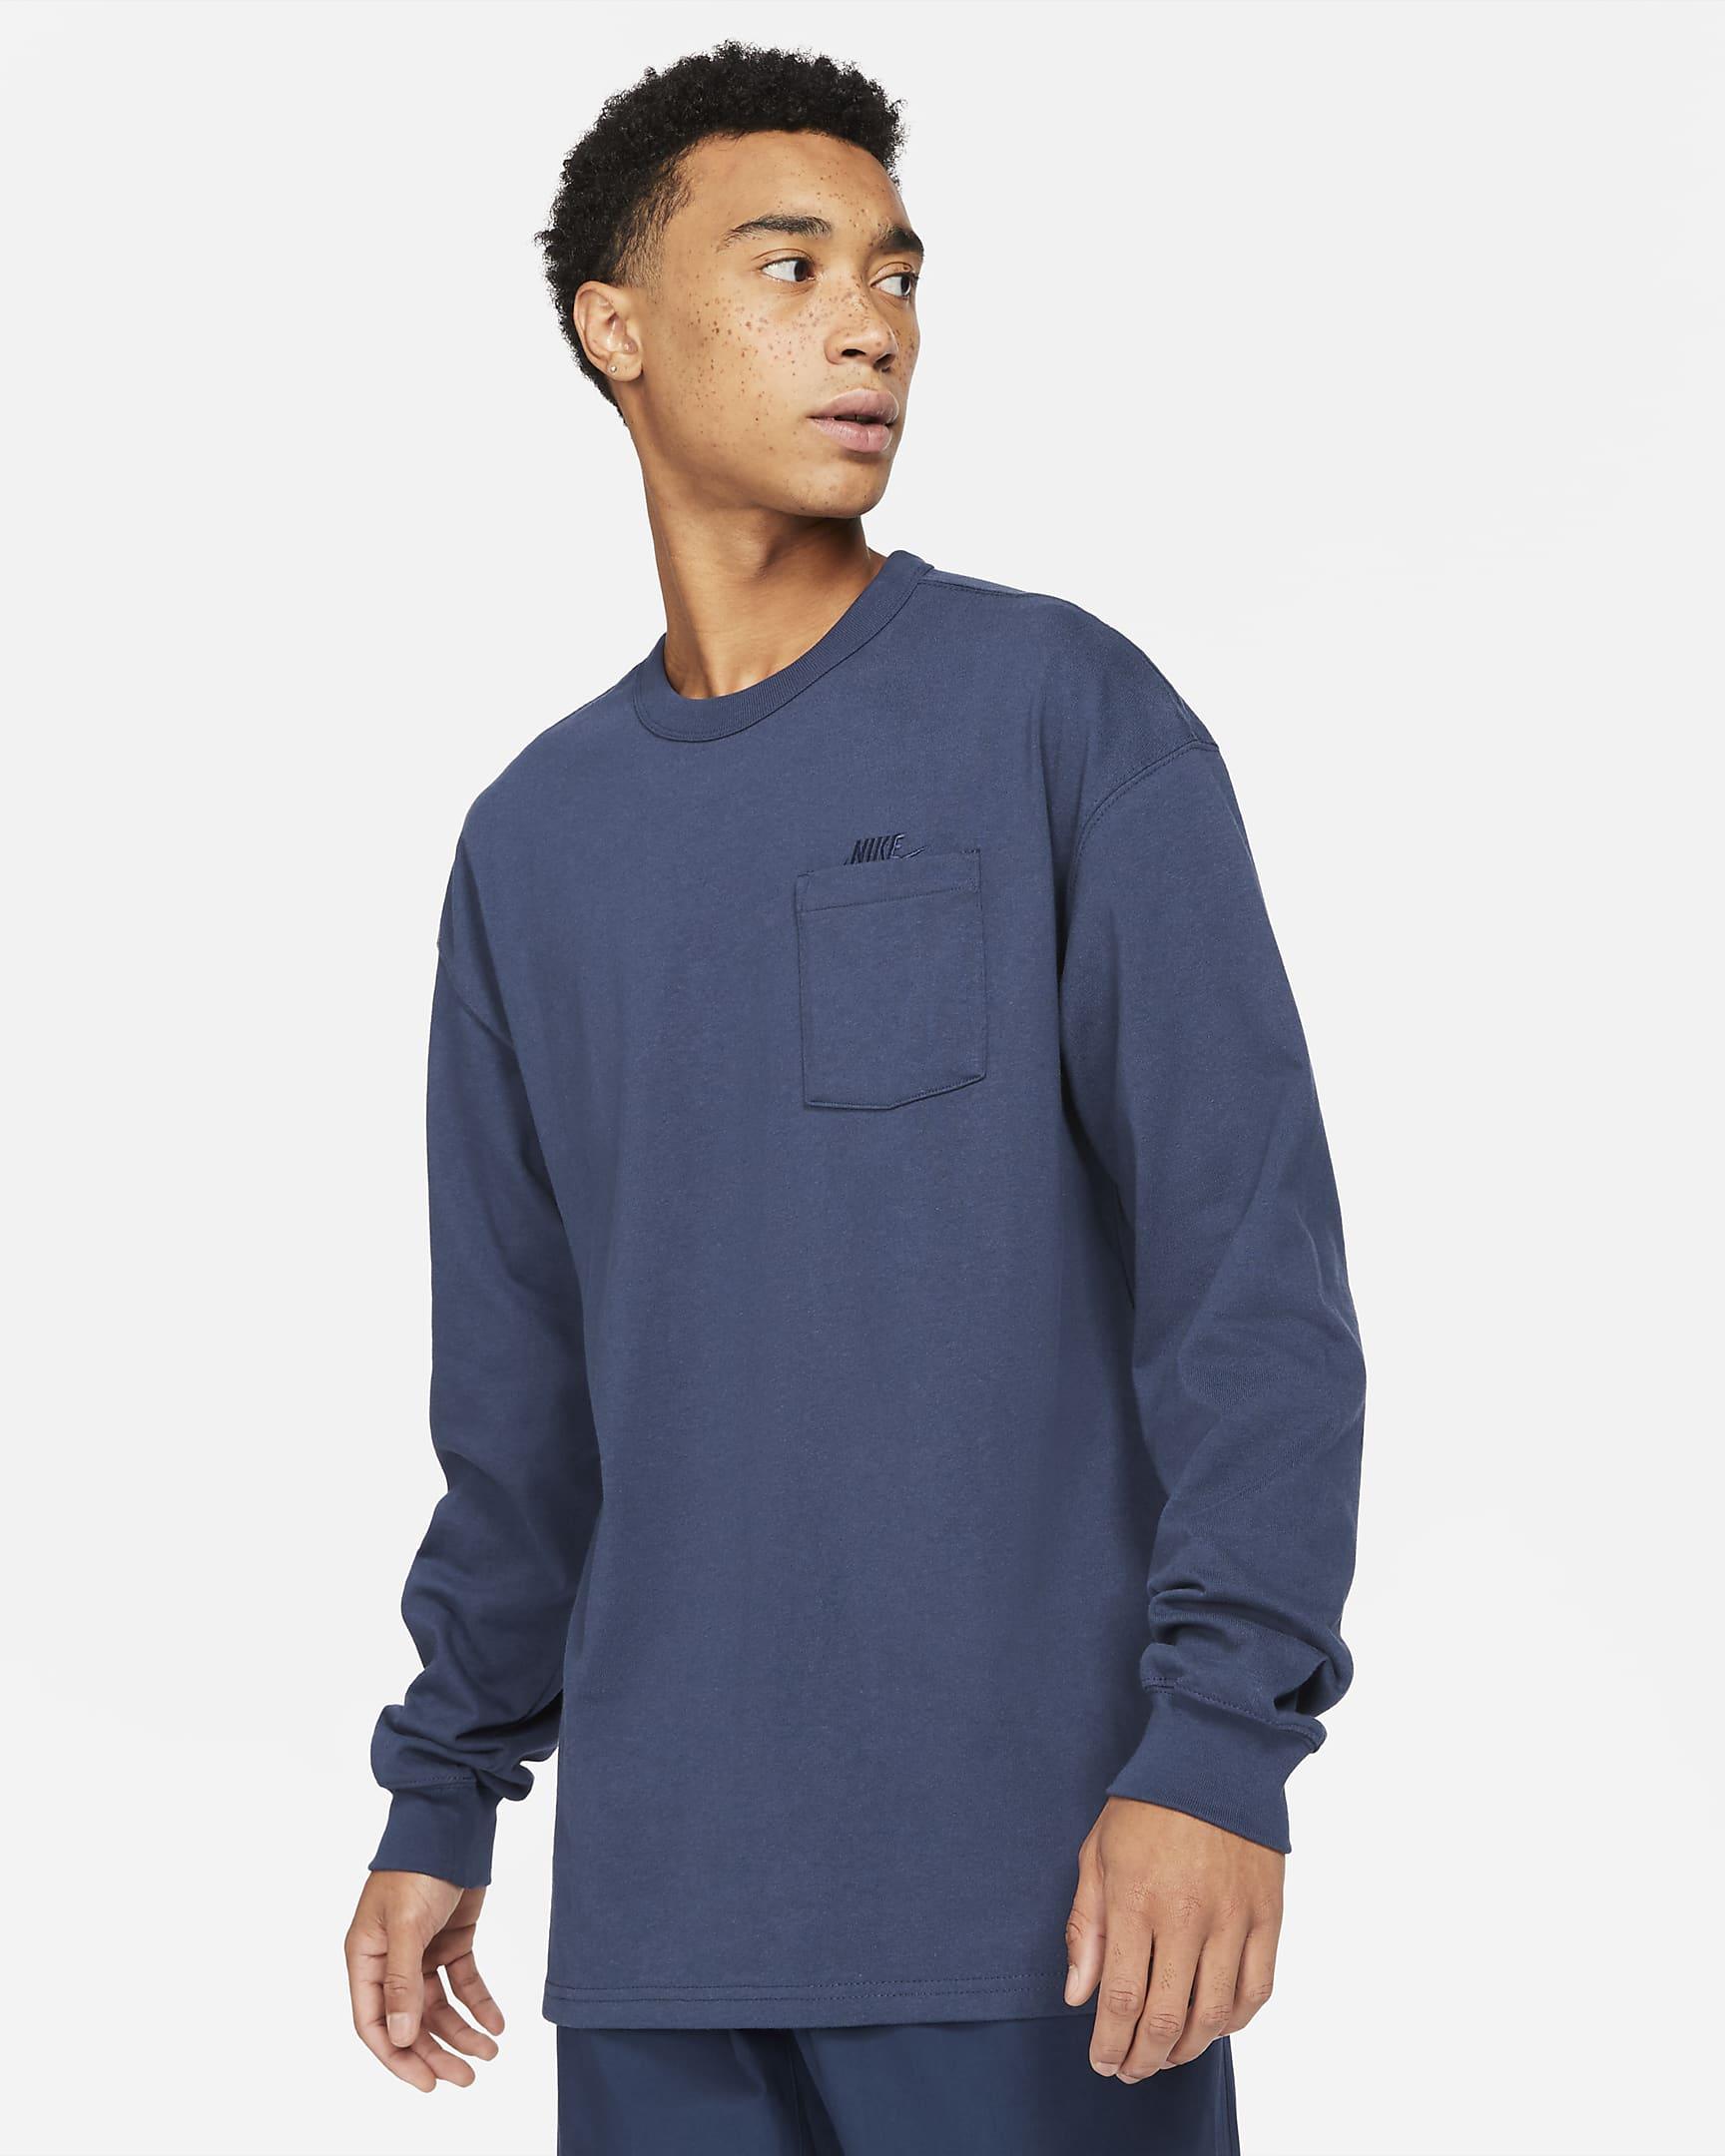 sportswear-premium-essentials-mens-long-sleeve-pocket-t-shirt-BgCNmZ